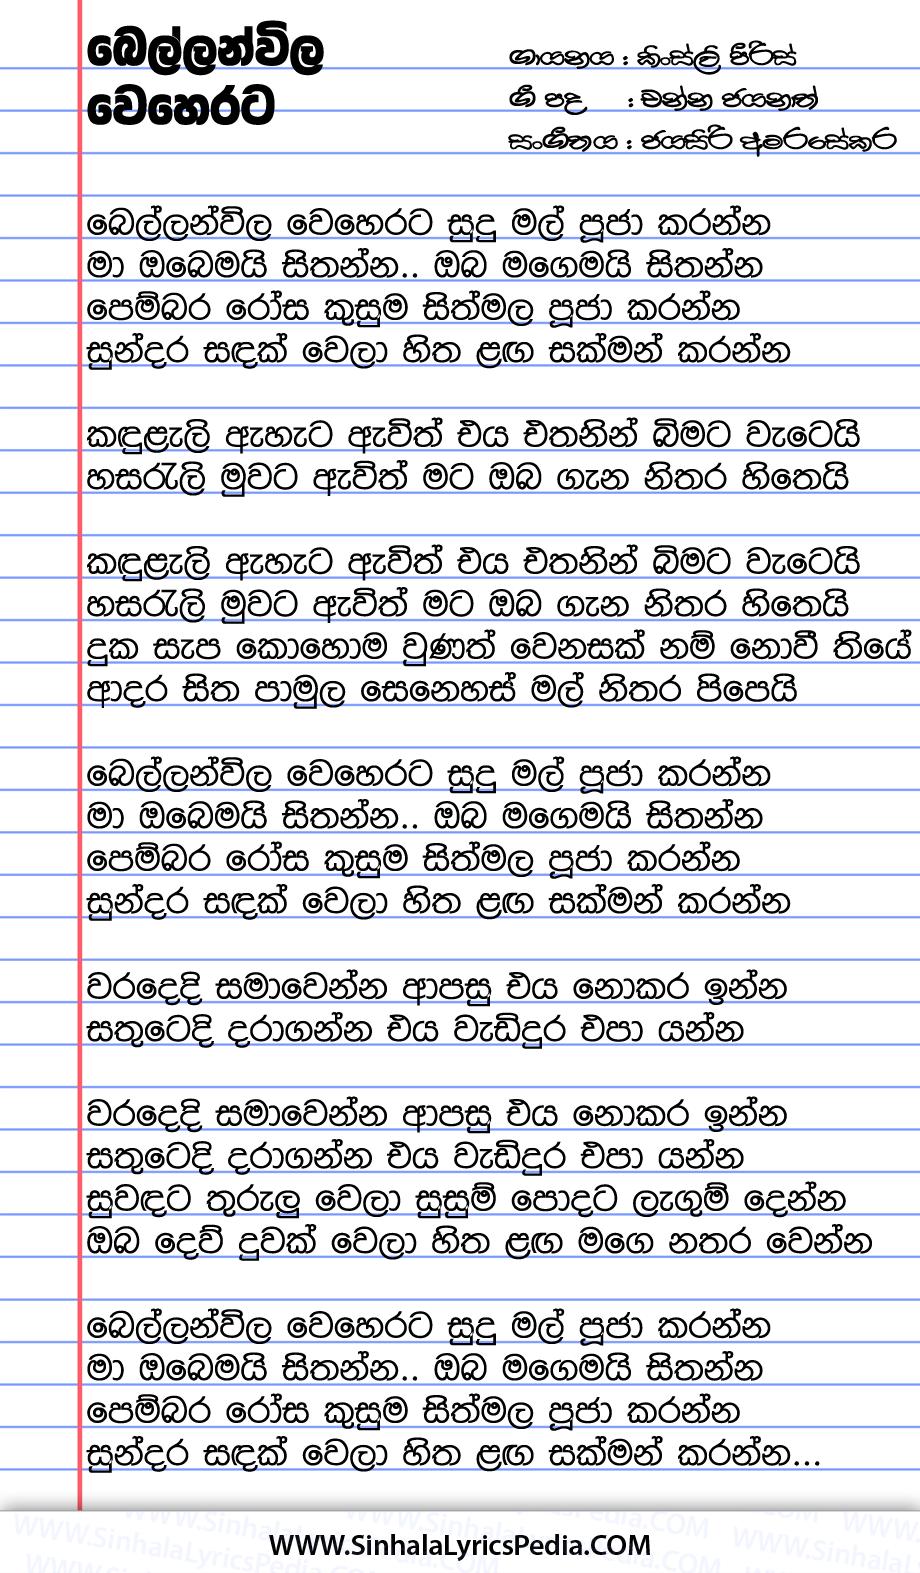 Bellanwila Weherata Sudu Mal Puja Karanna Song Lyrics